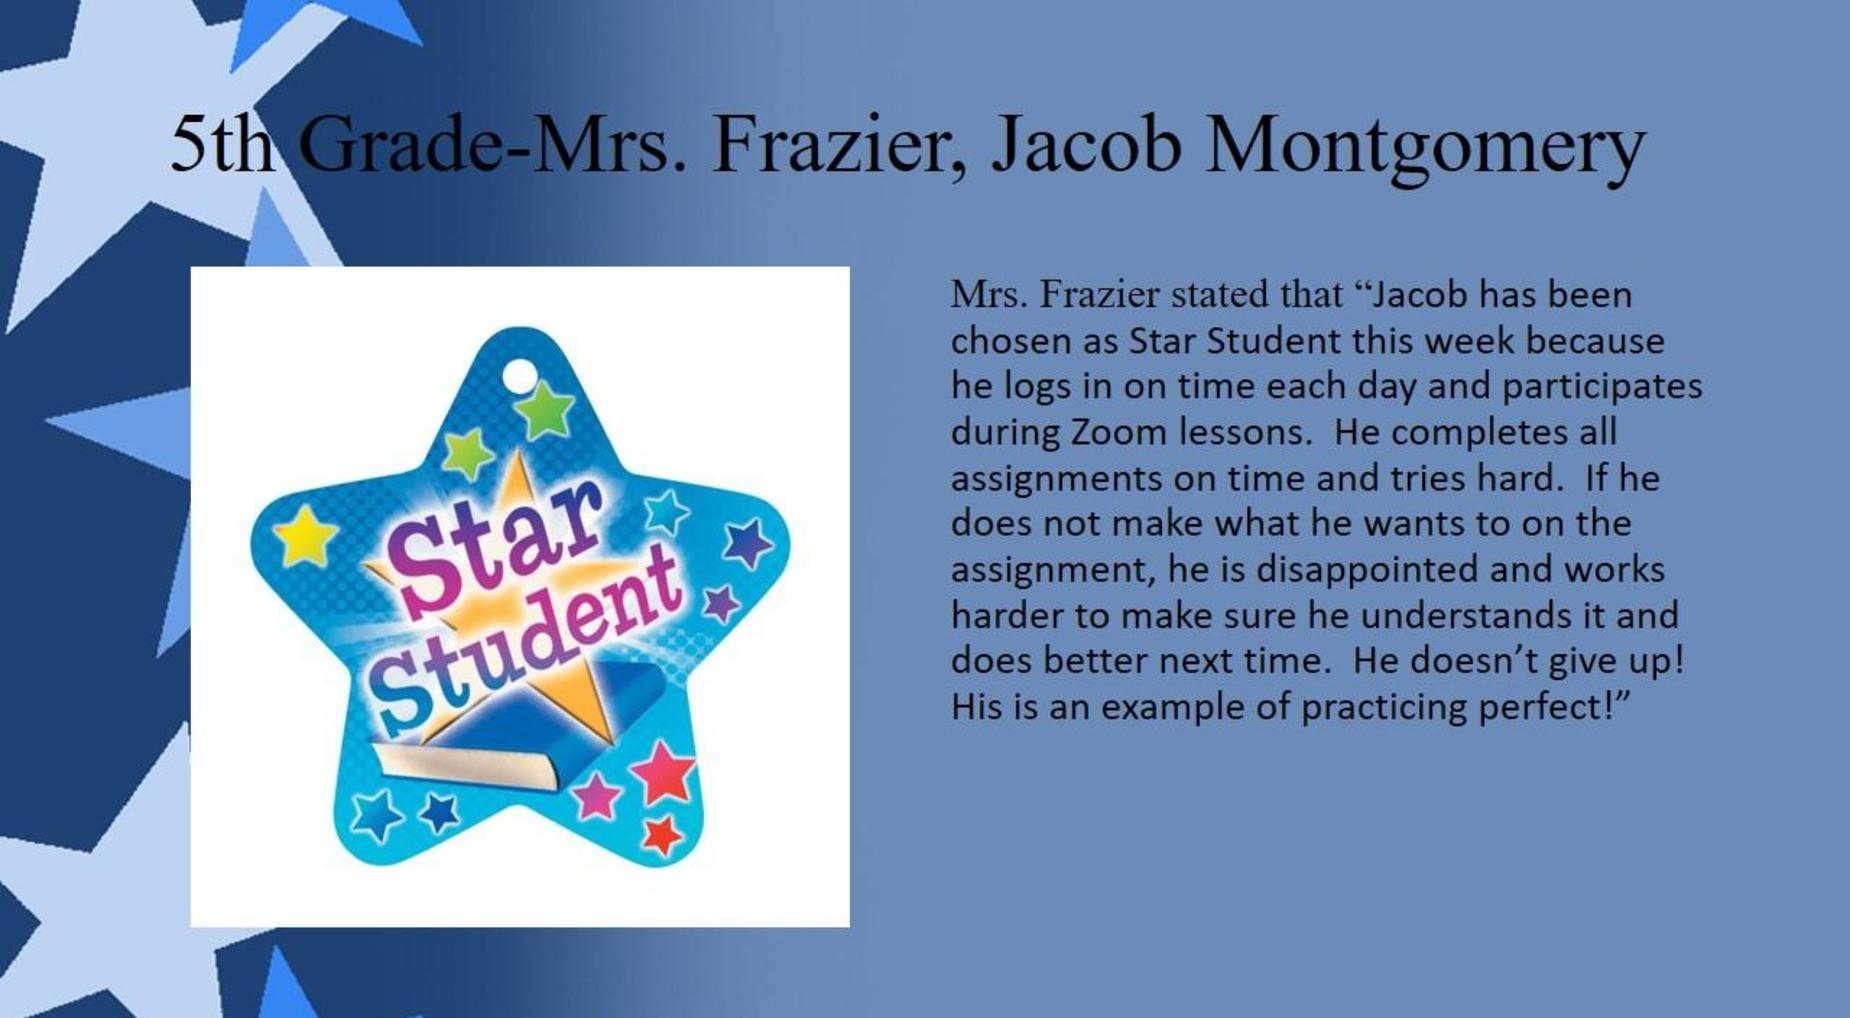 Jacob Montgomery, 5th Grade